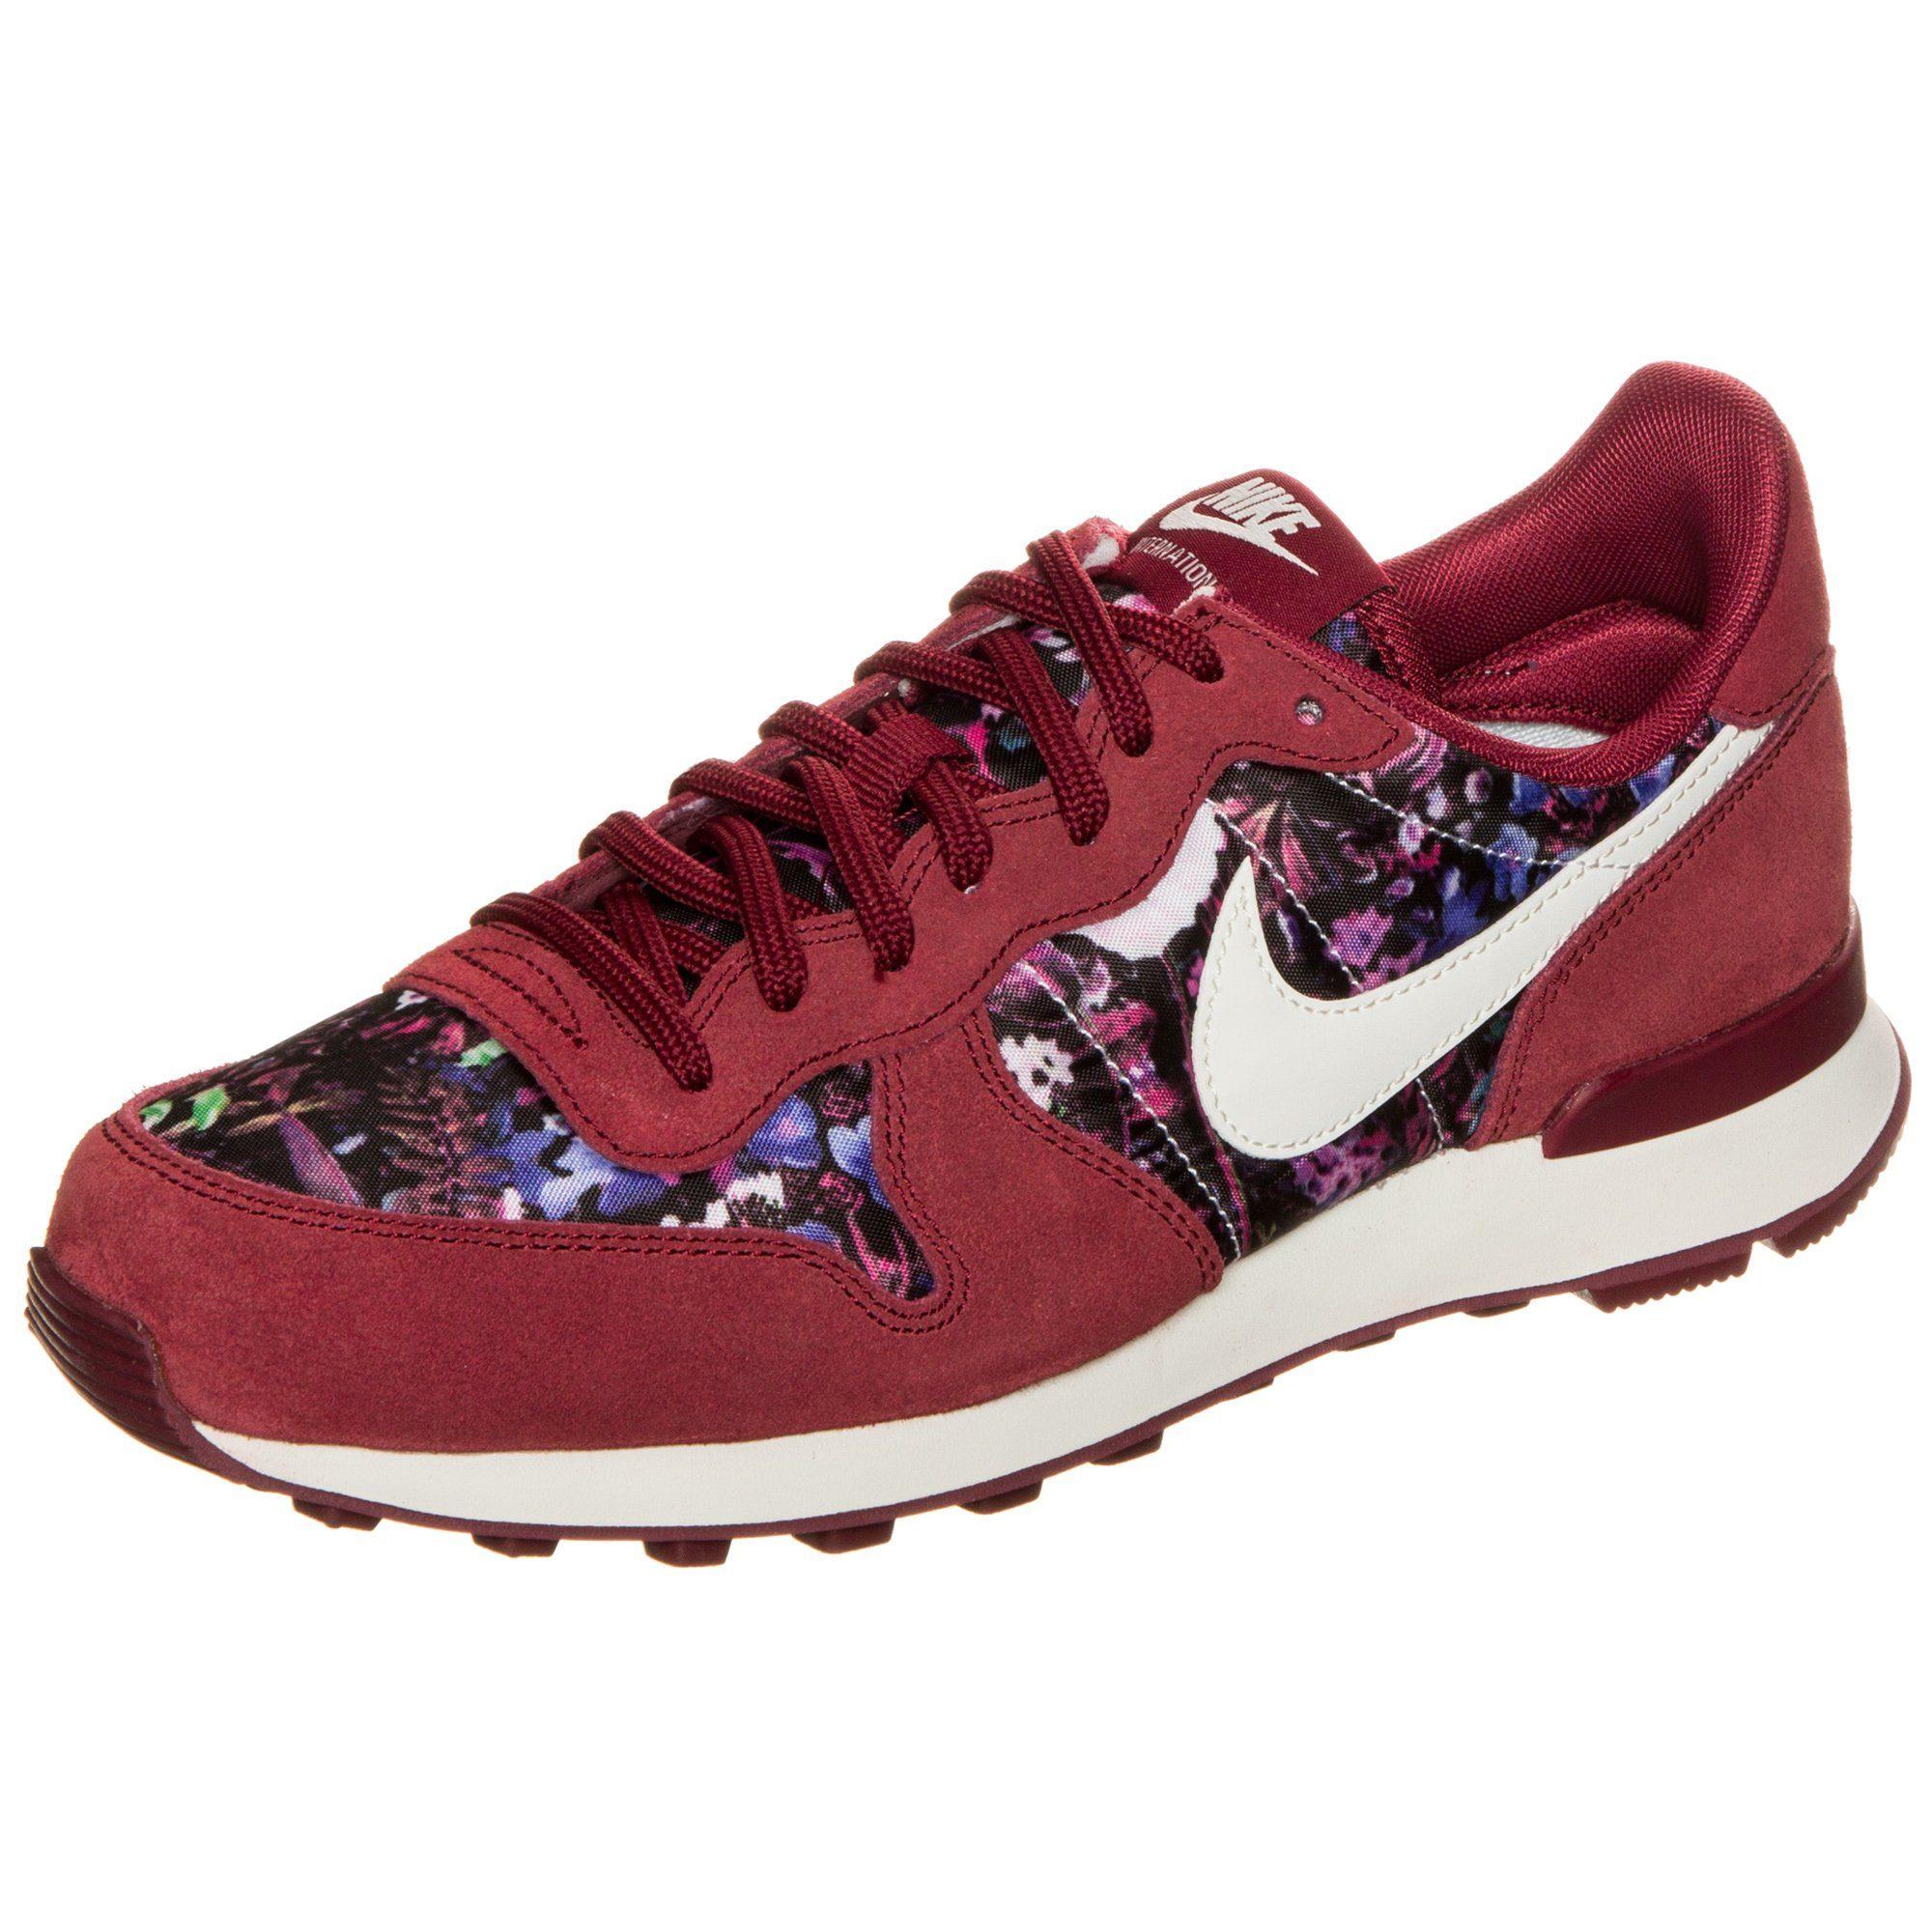 new product e0cde d012f Bildquelle  Nike Sportswear Internationalist Premium Sneaker Damen